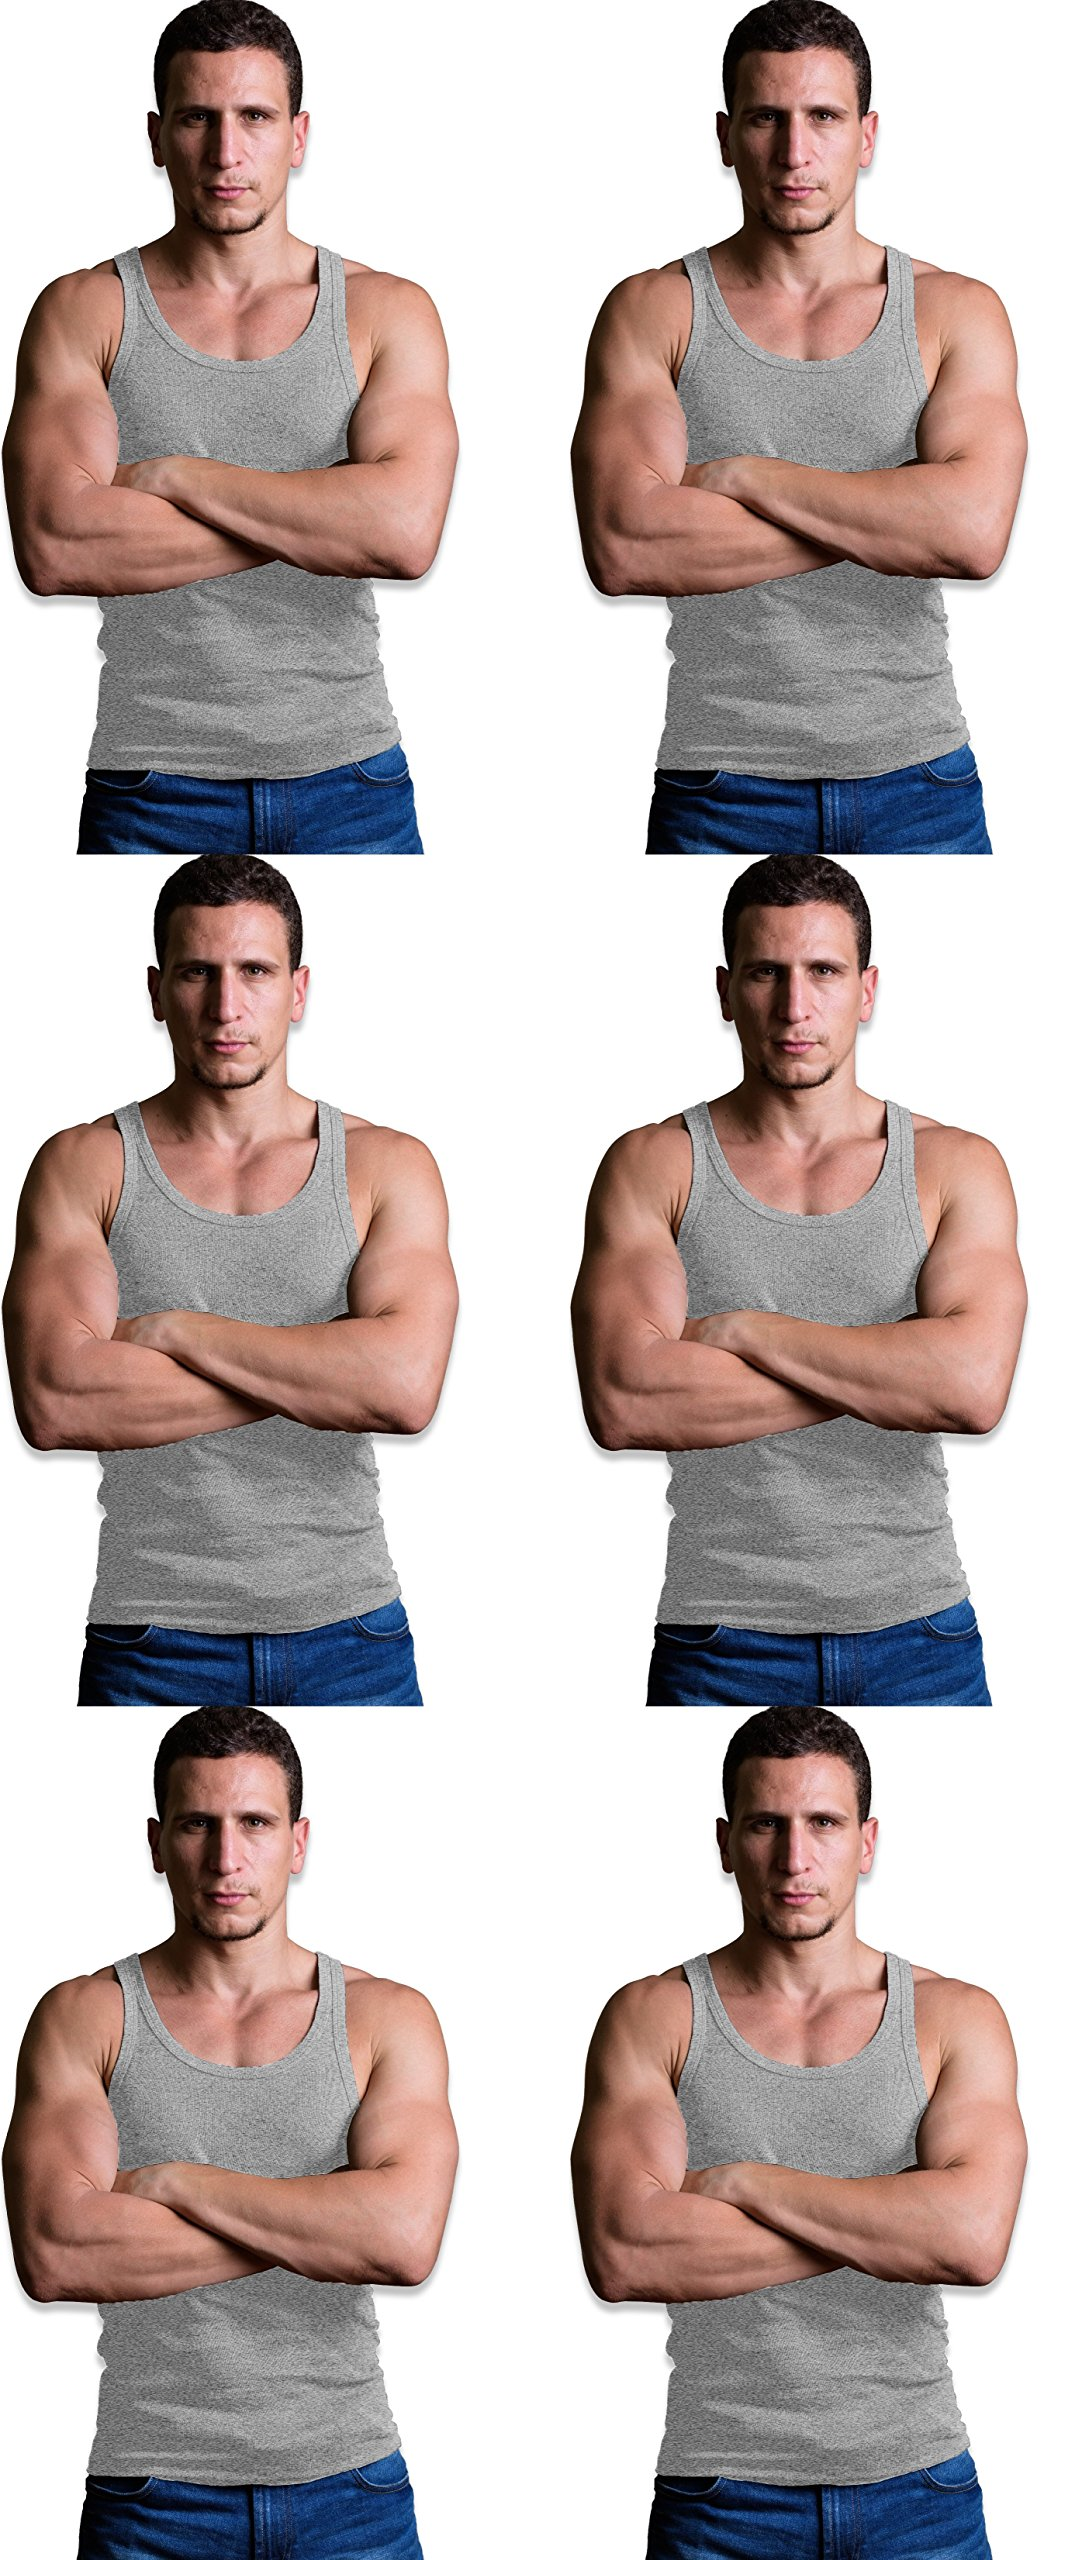 Andrew Scott Men's 6 Pack Big & Tall Man Extra Long Color Tank Top A Shirt (6 Pack - Gray, XX-Large Tall)